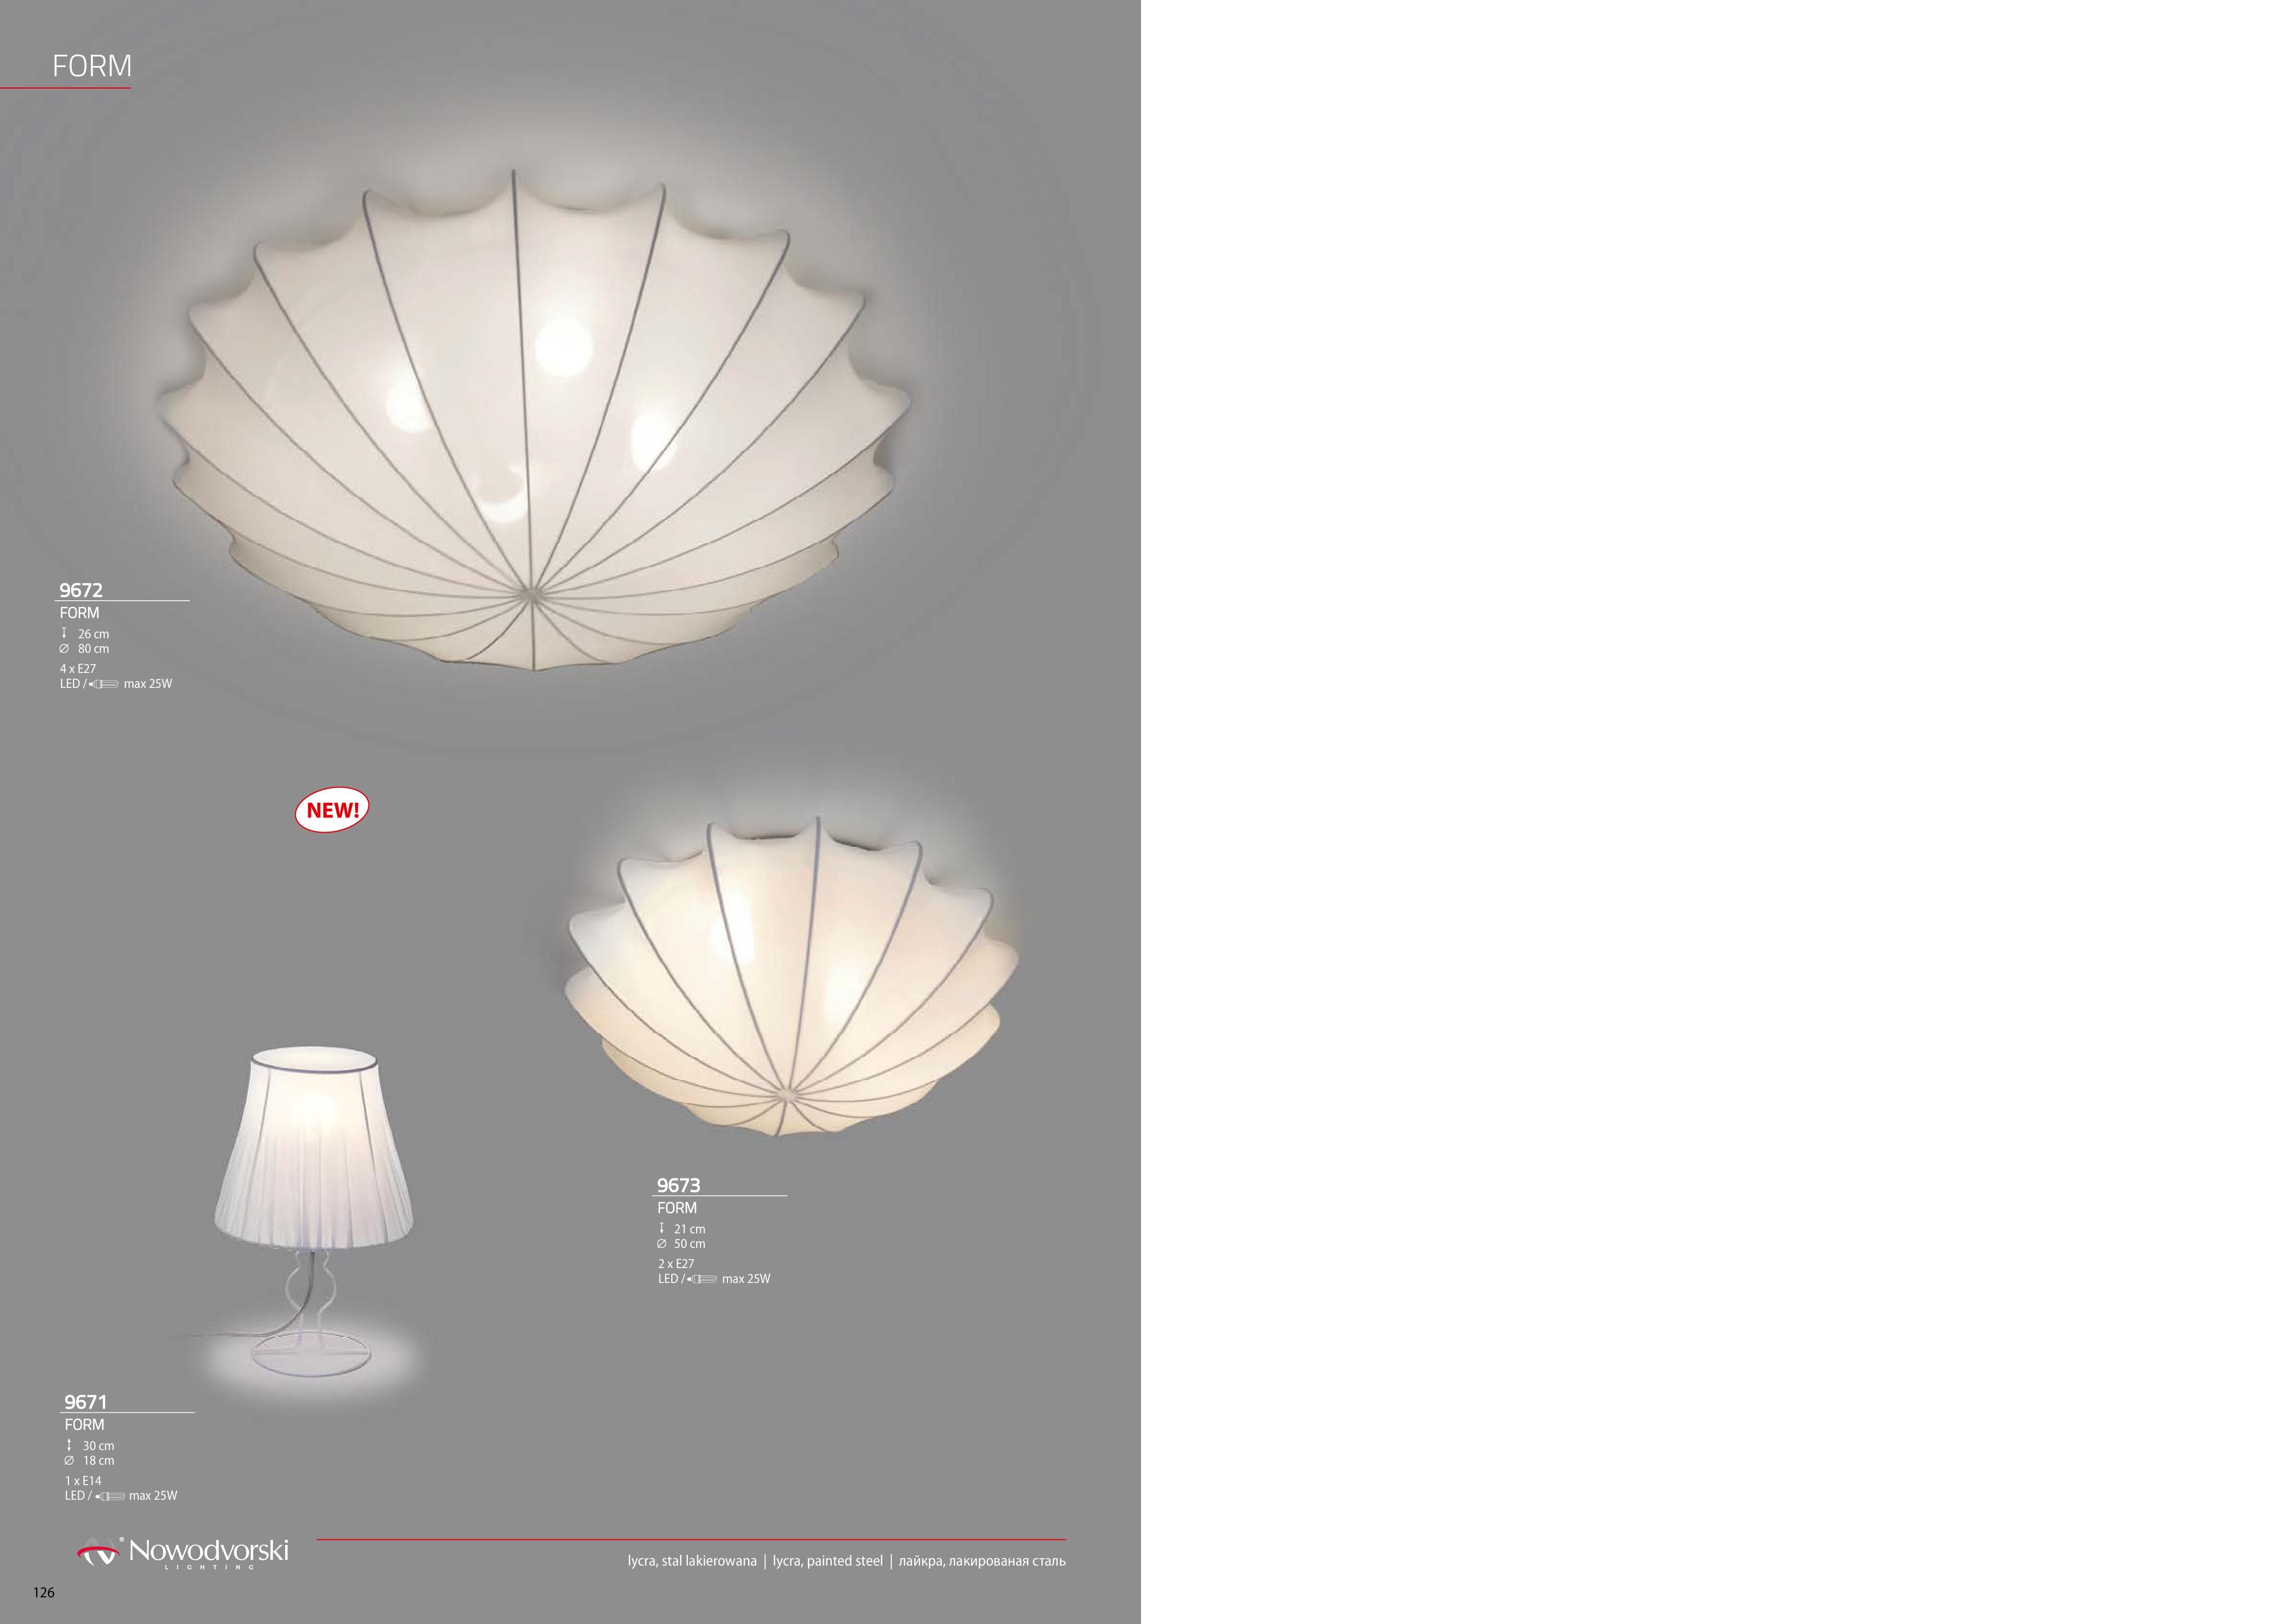 Настольная лампа Nowodvorski Form 9671, 1xE14x25W, белый, металл, текстиль - фото 3